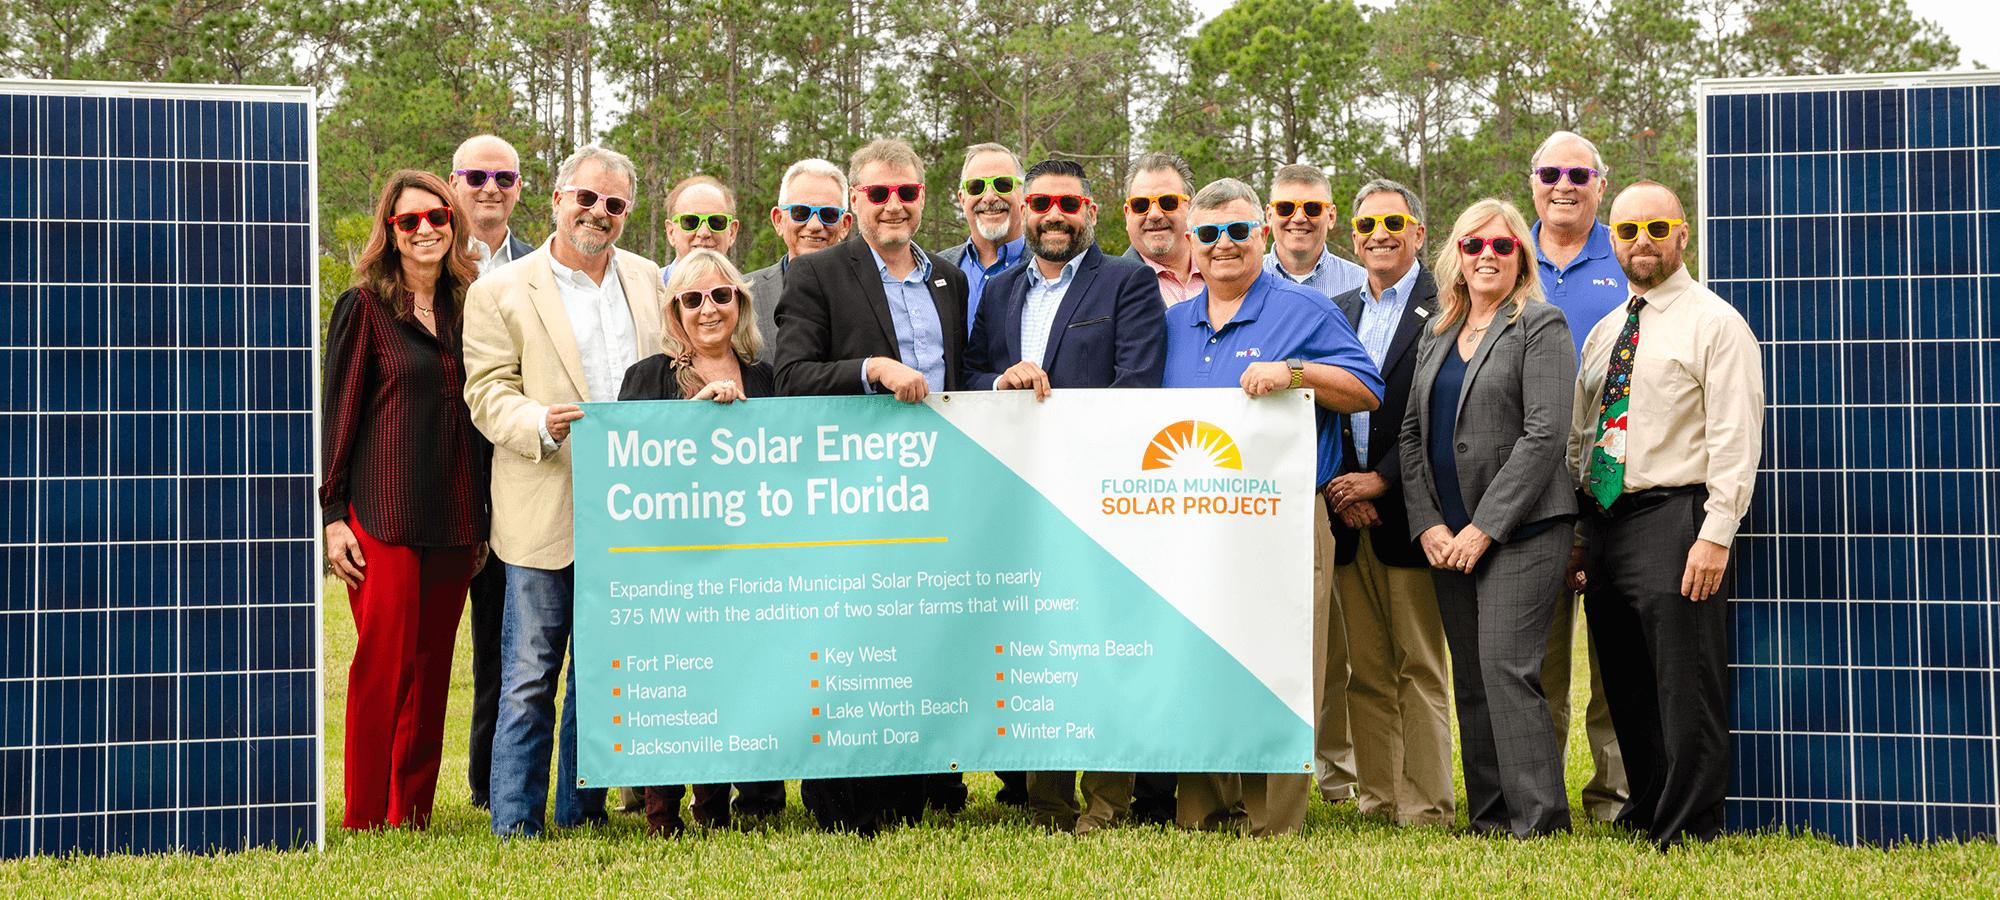 Florida Municipal Solar Project Phase II Announcement